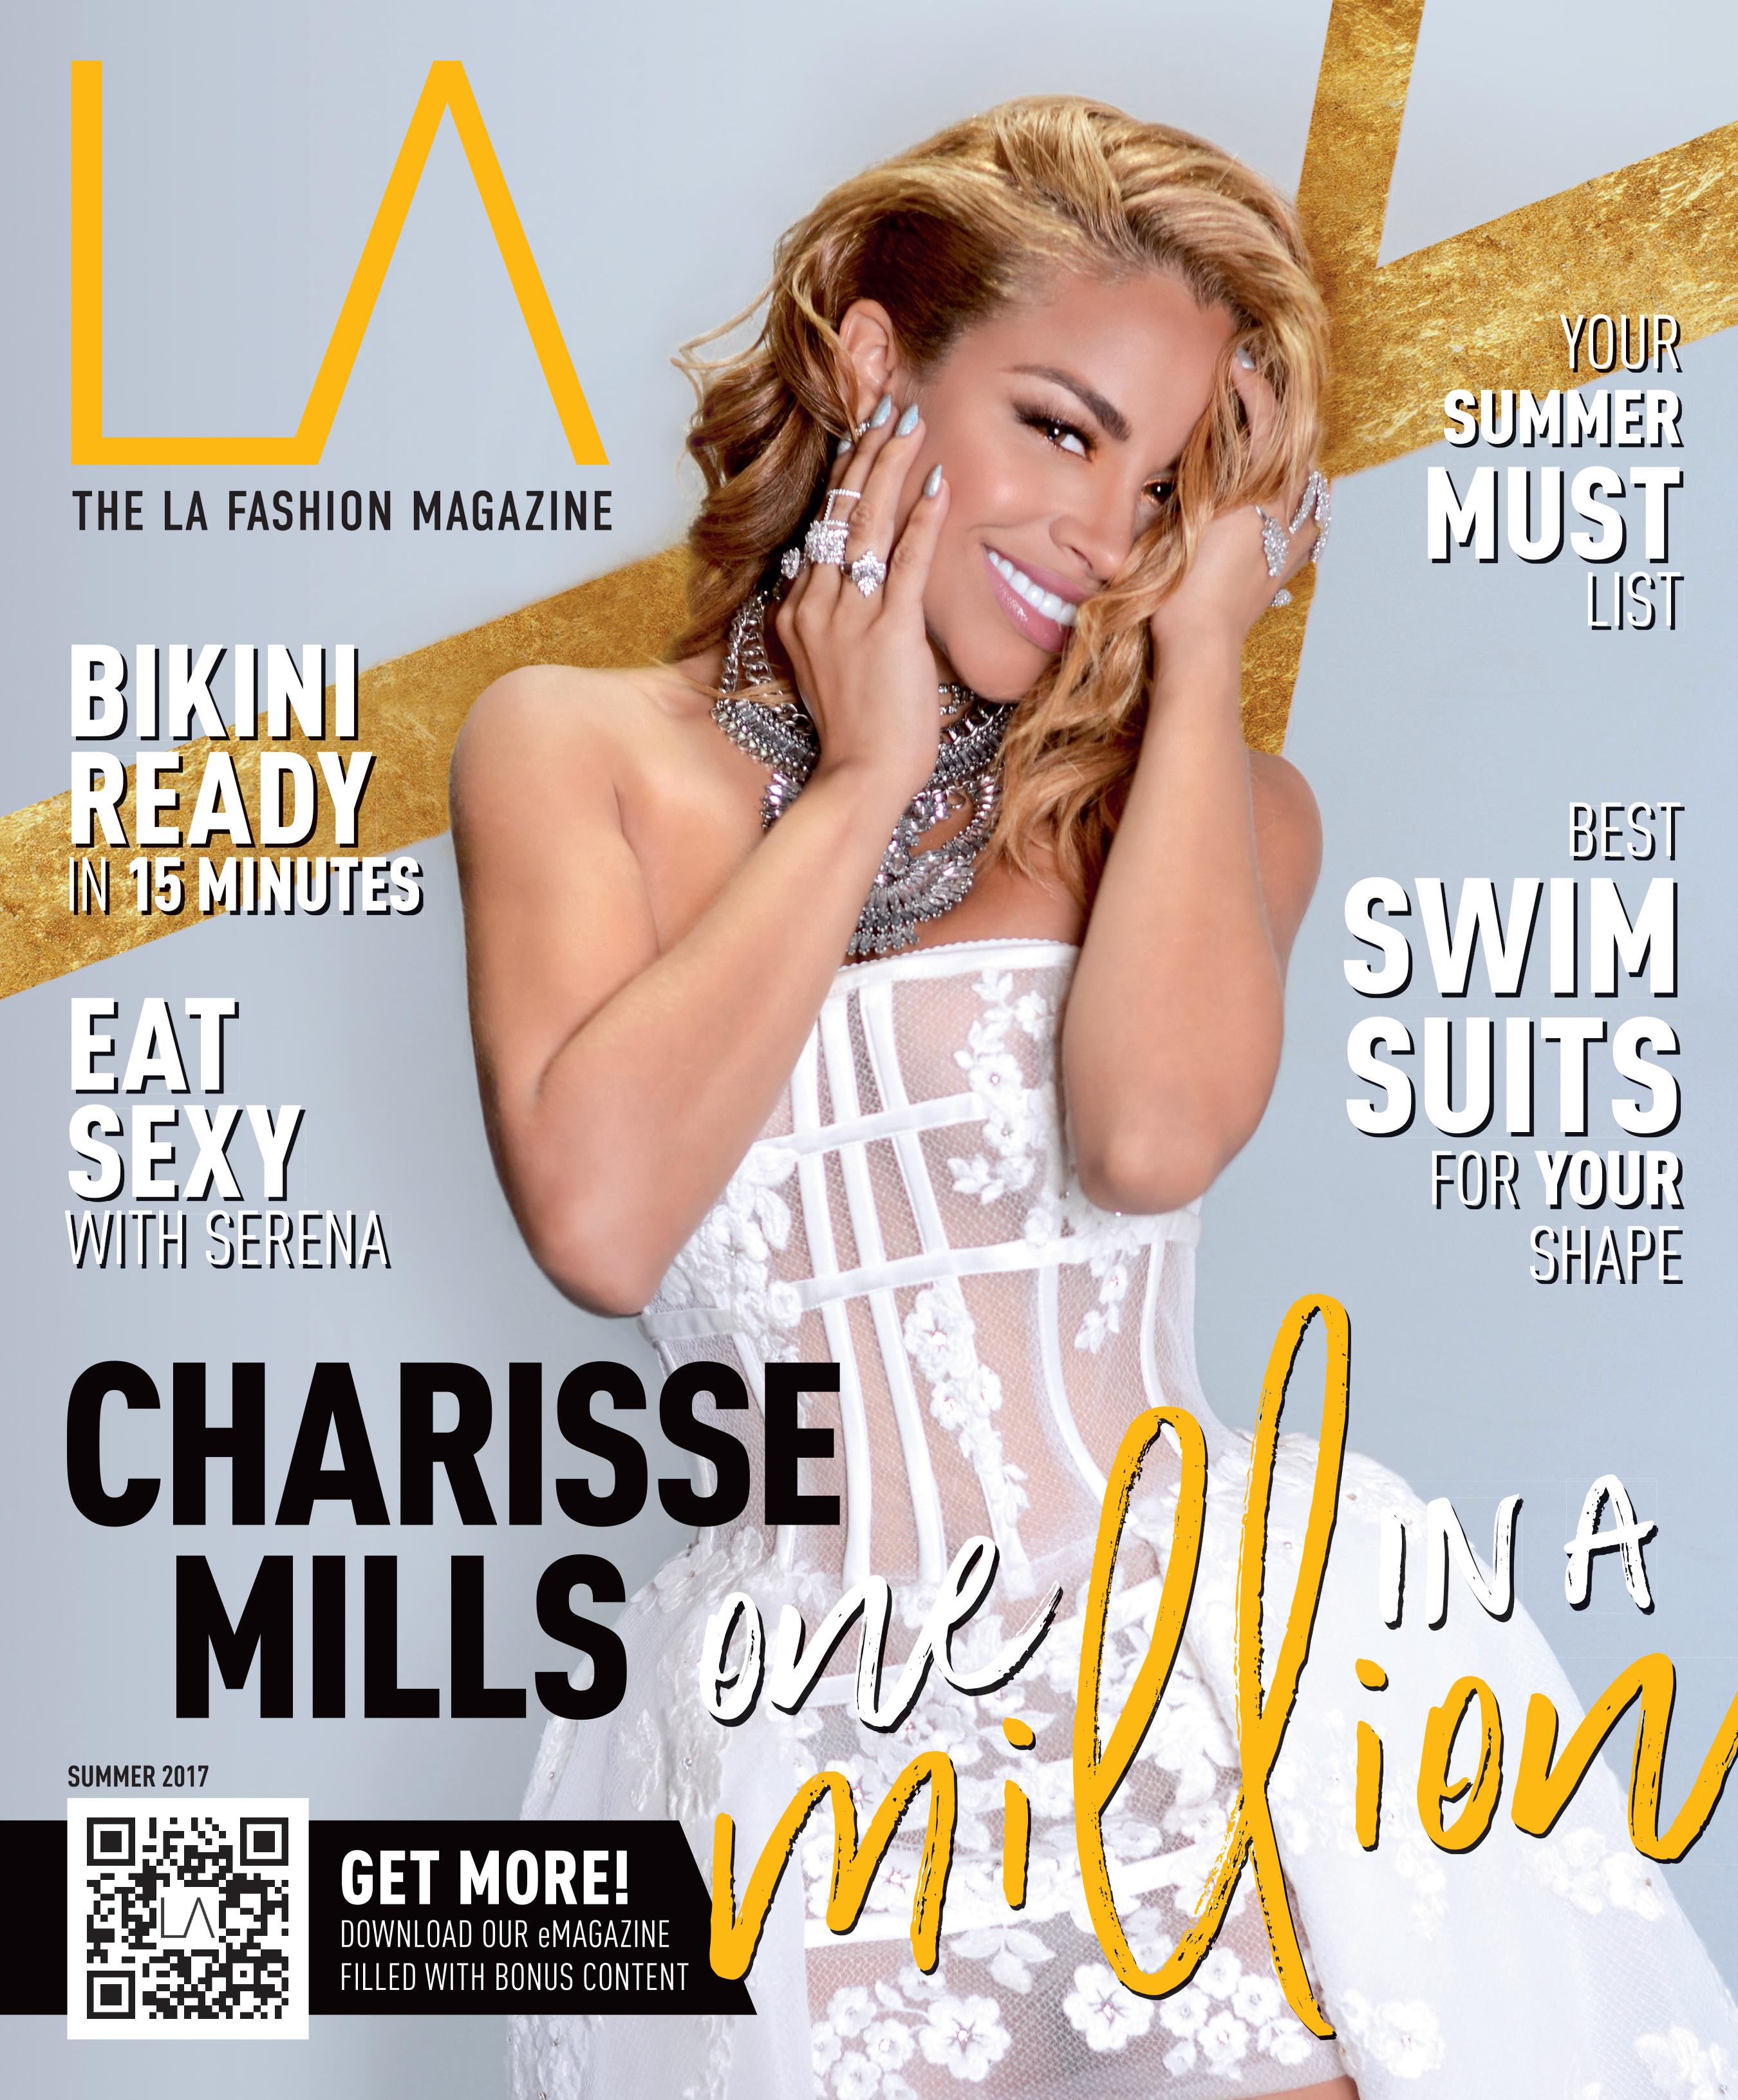 E magazine los angeles fashion la fashion magazine summer 17 day sisterspd